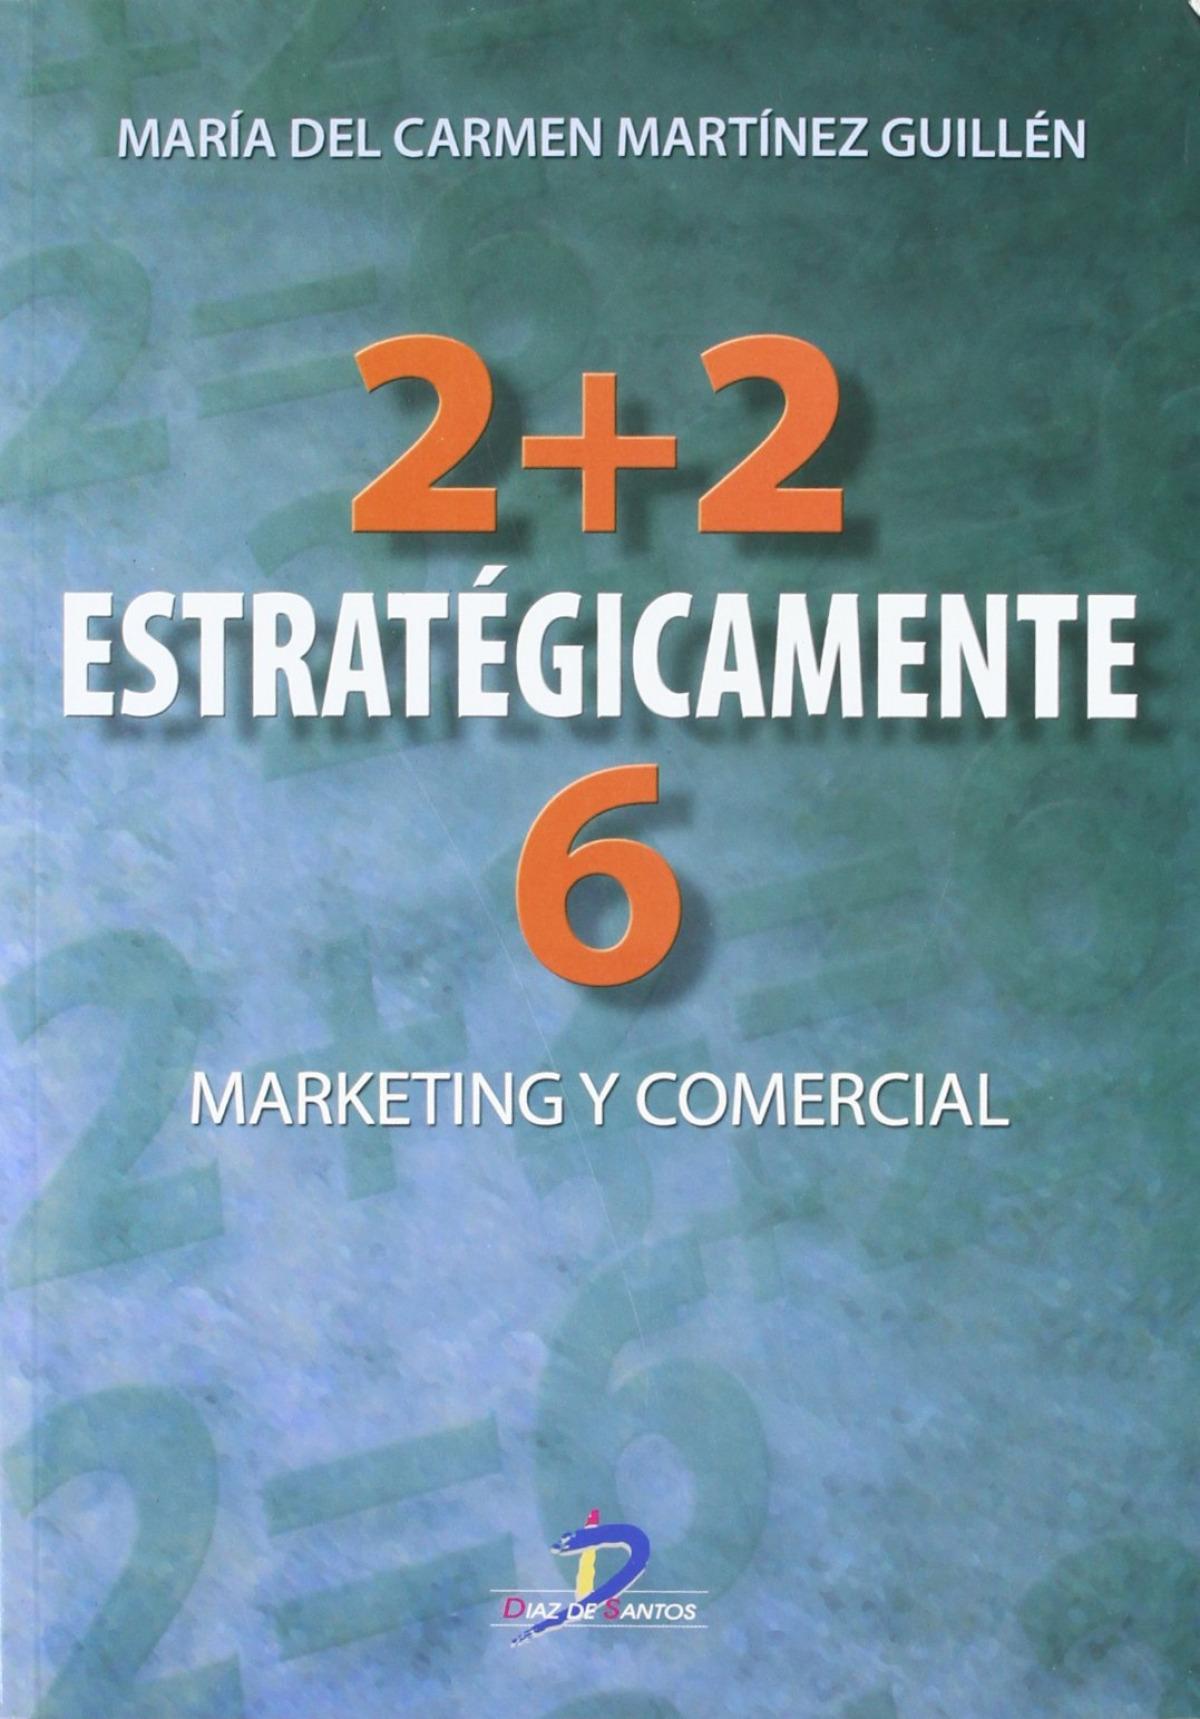 2+2 estrategicamente 6